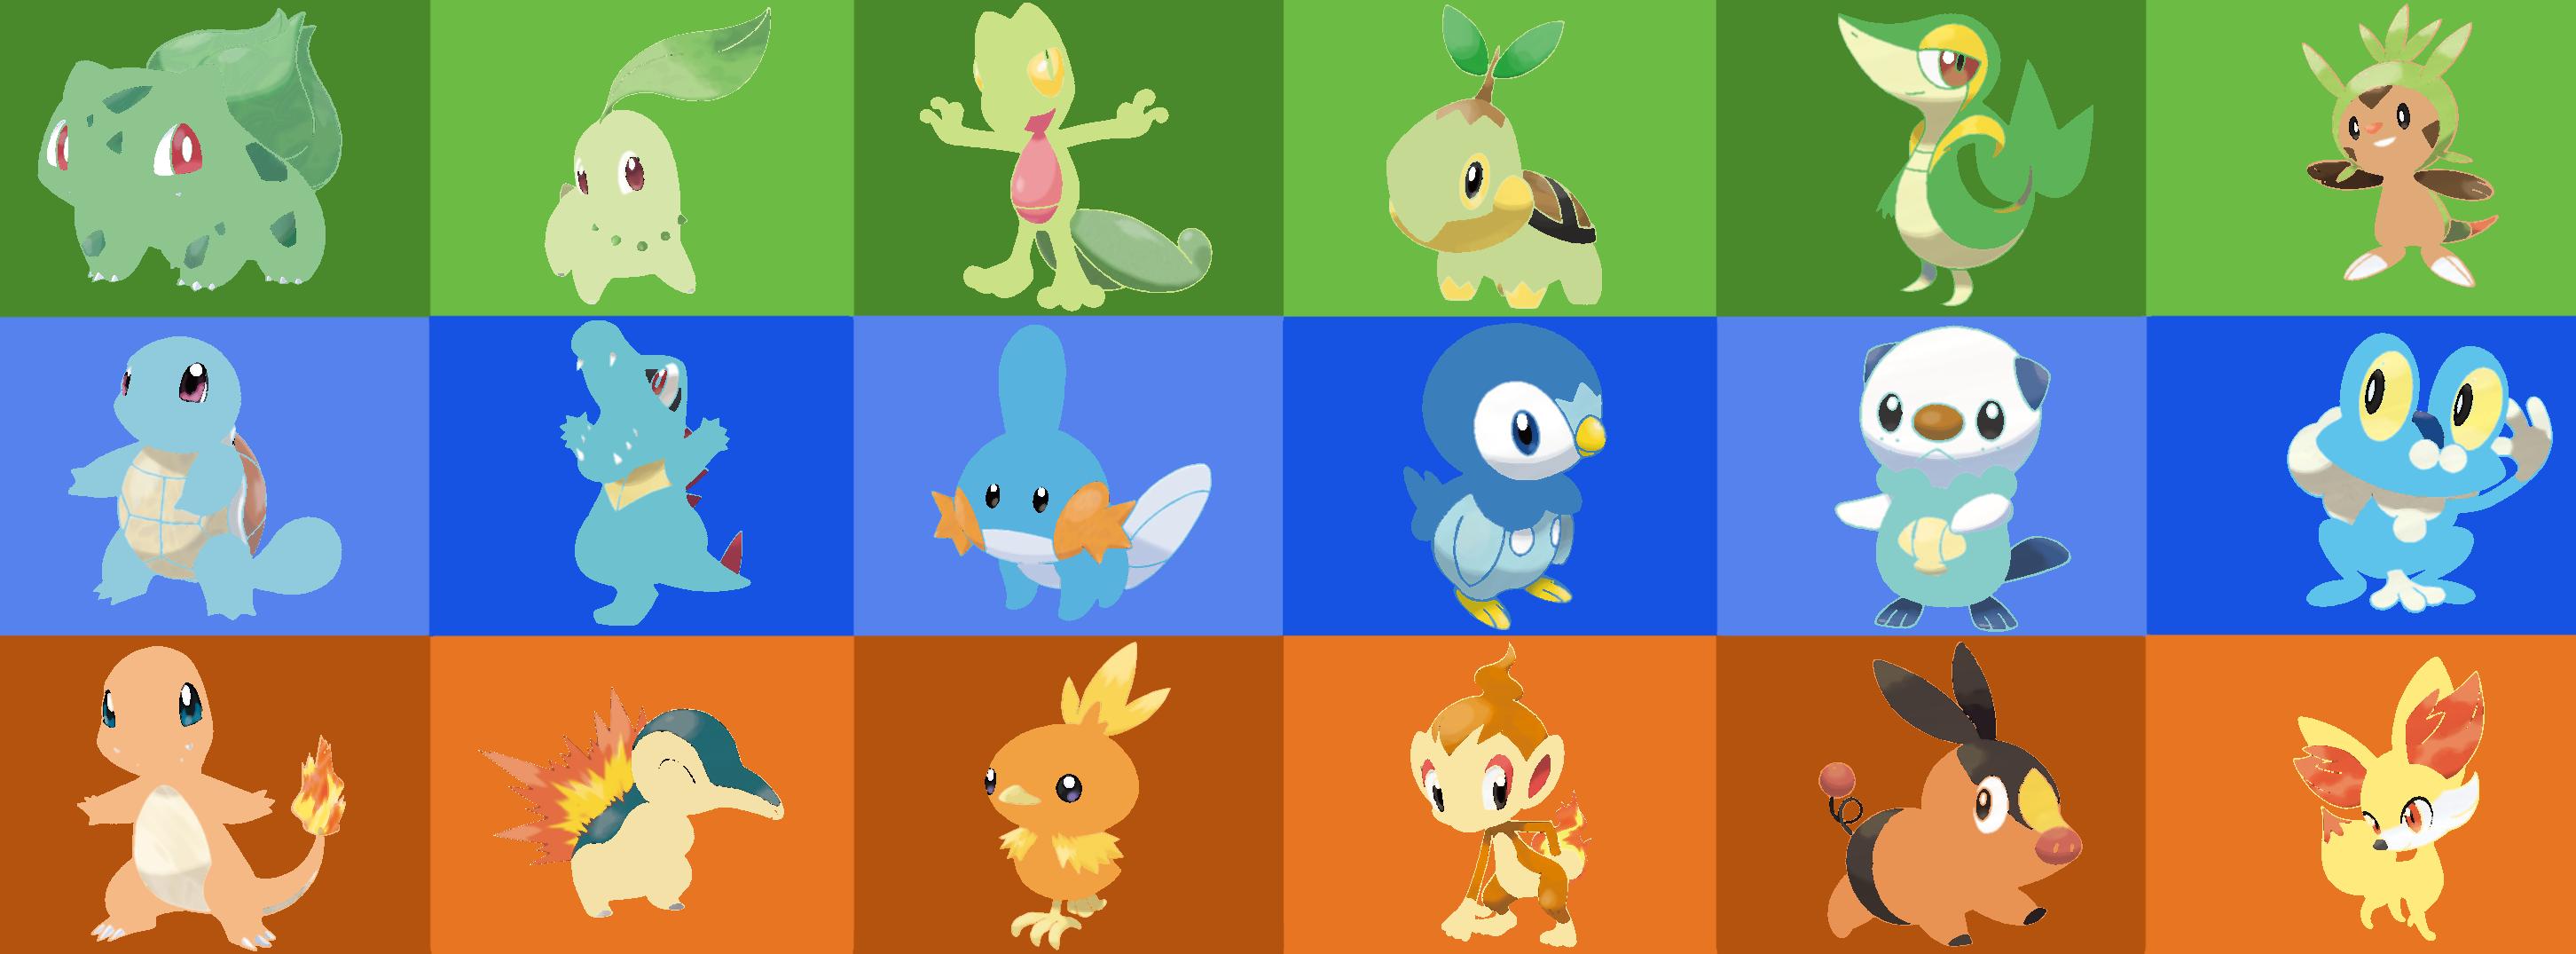 all starter pokemon pictures